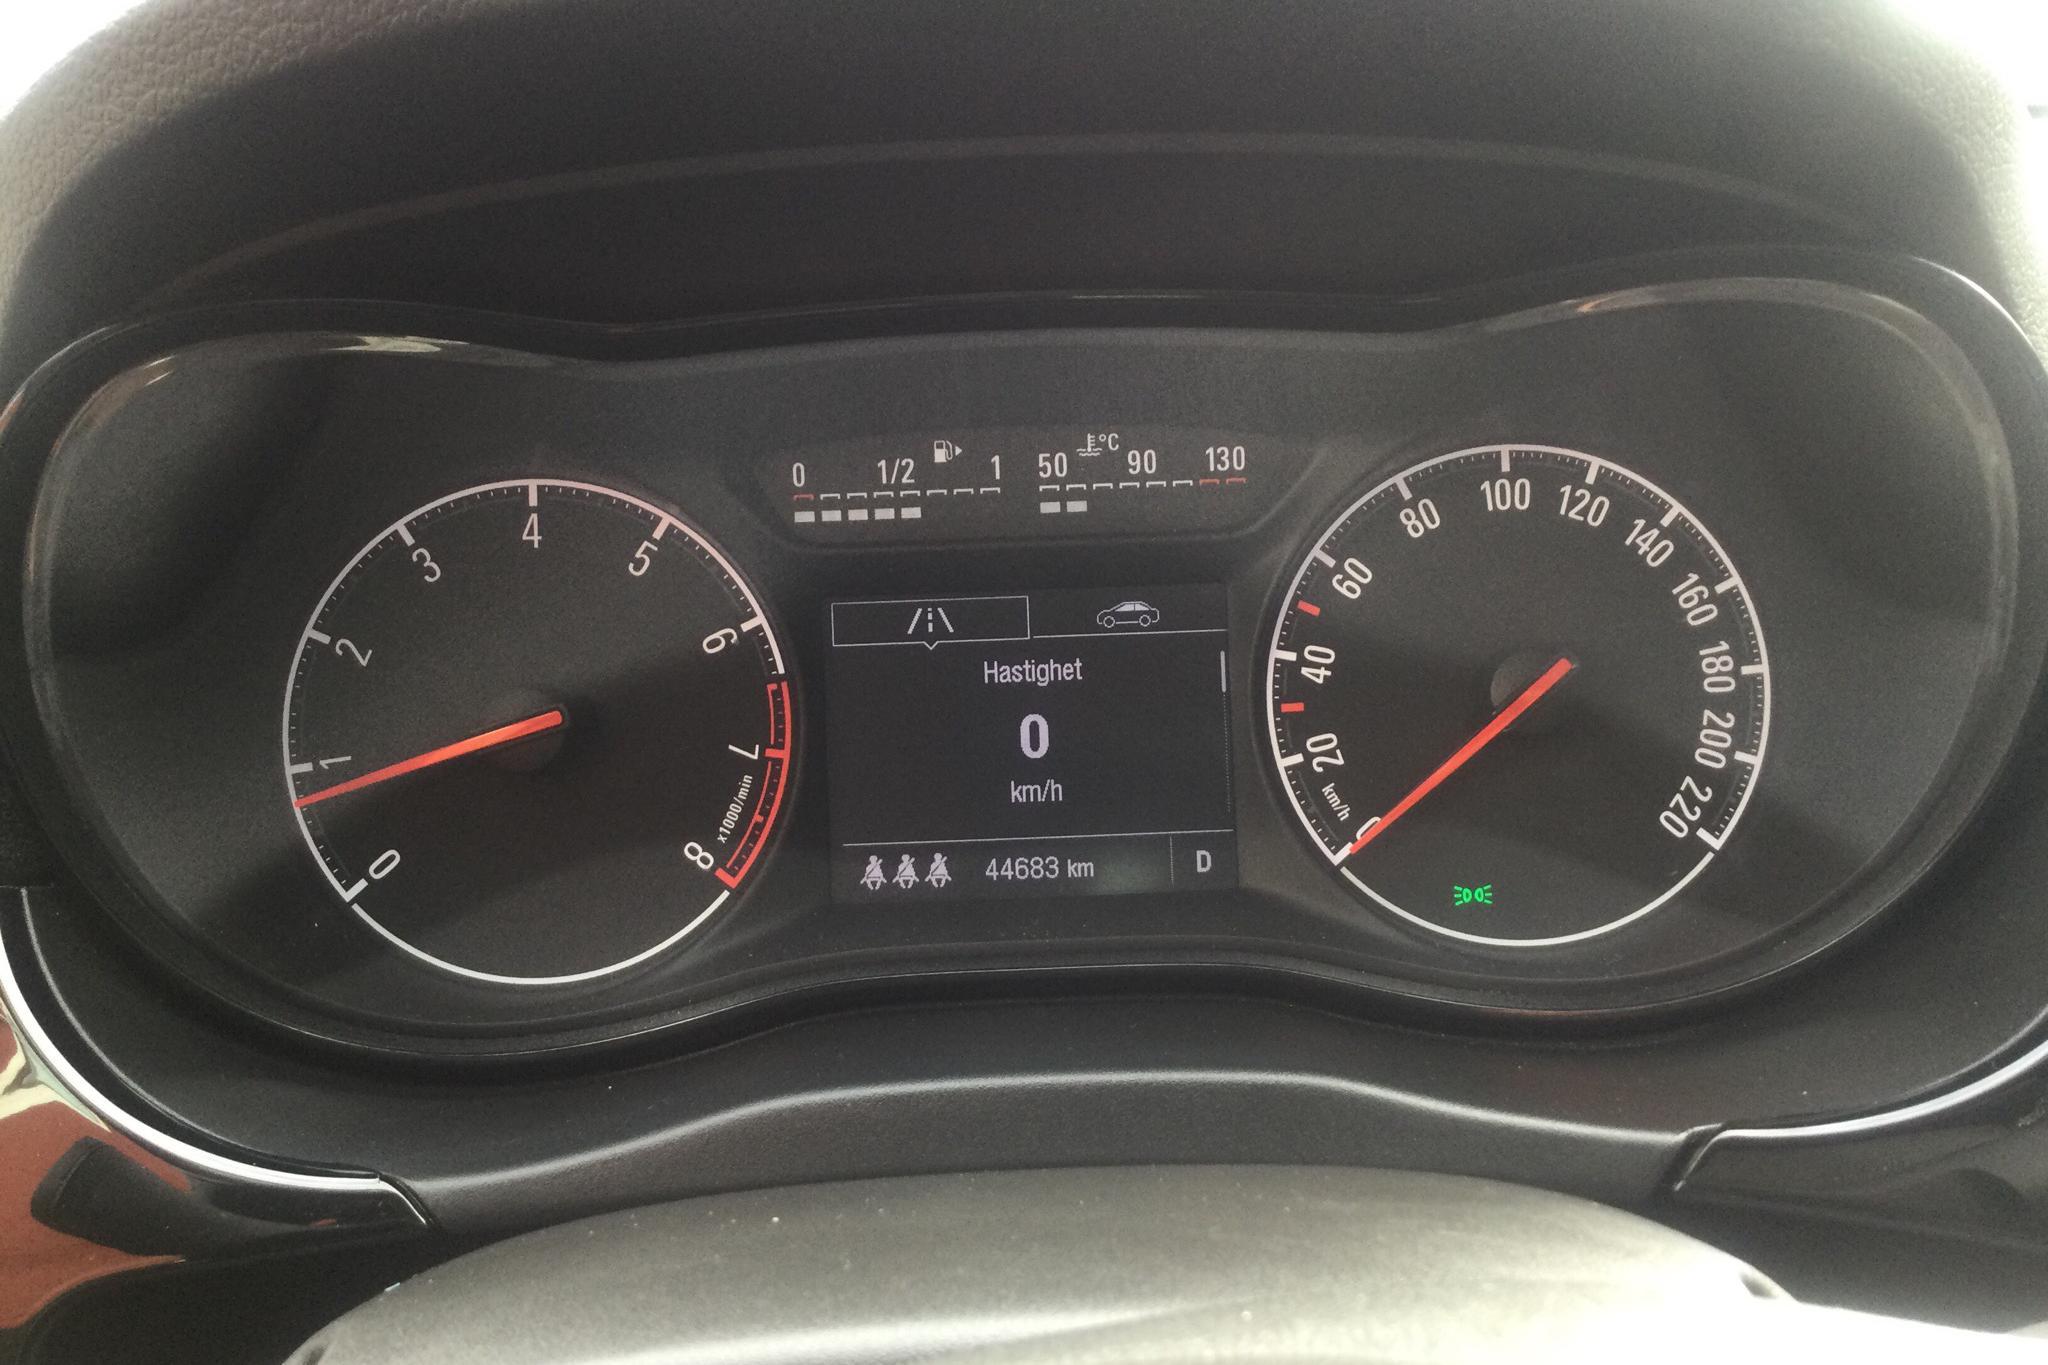 Opel Corsa 1.4 ECOTEC 5dr (90hk) - 44 680 km - Automatic - gray - 2015